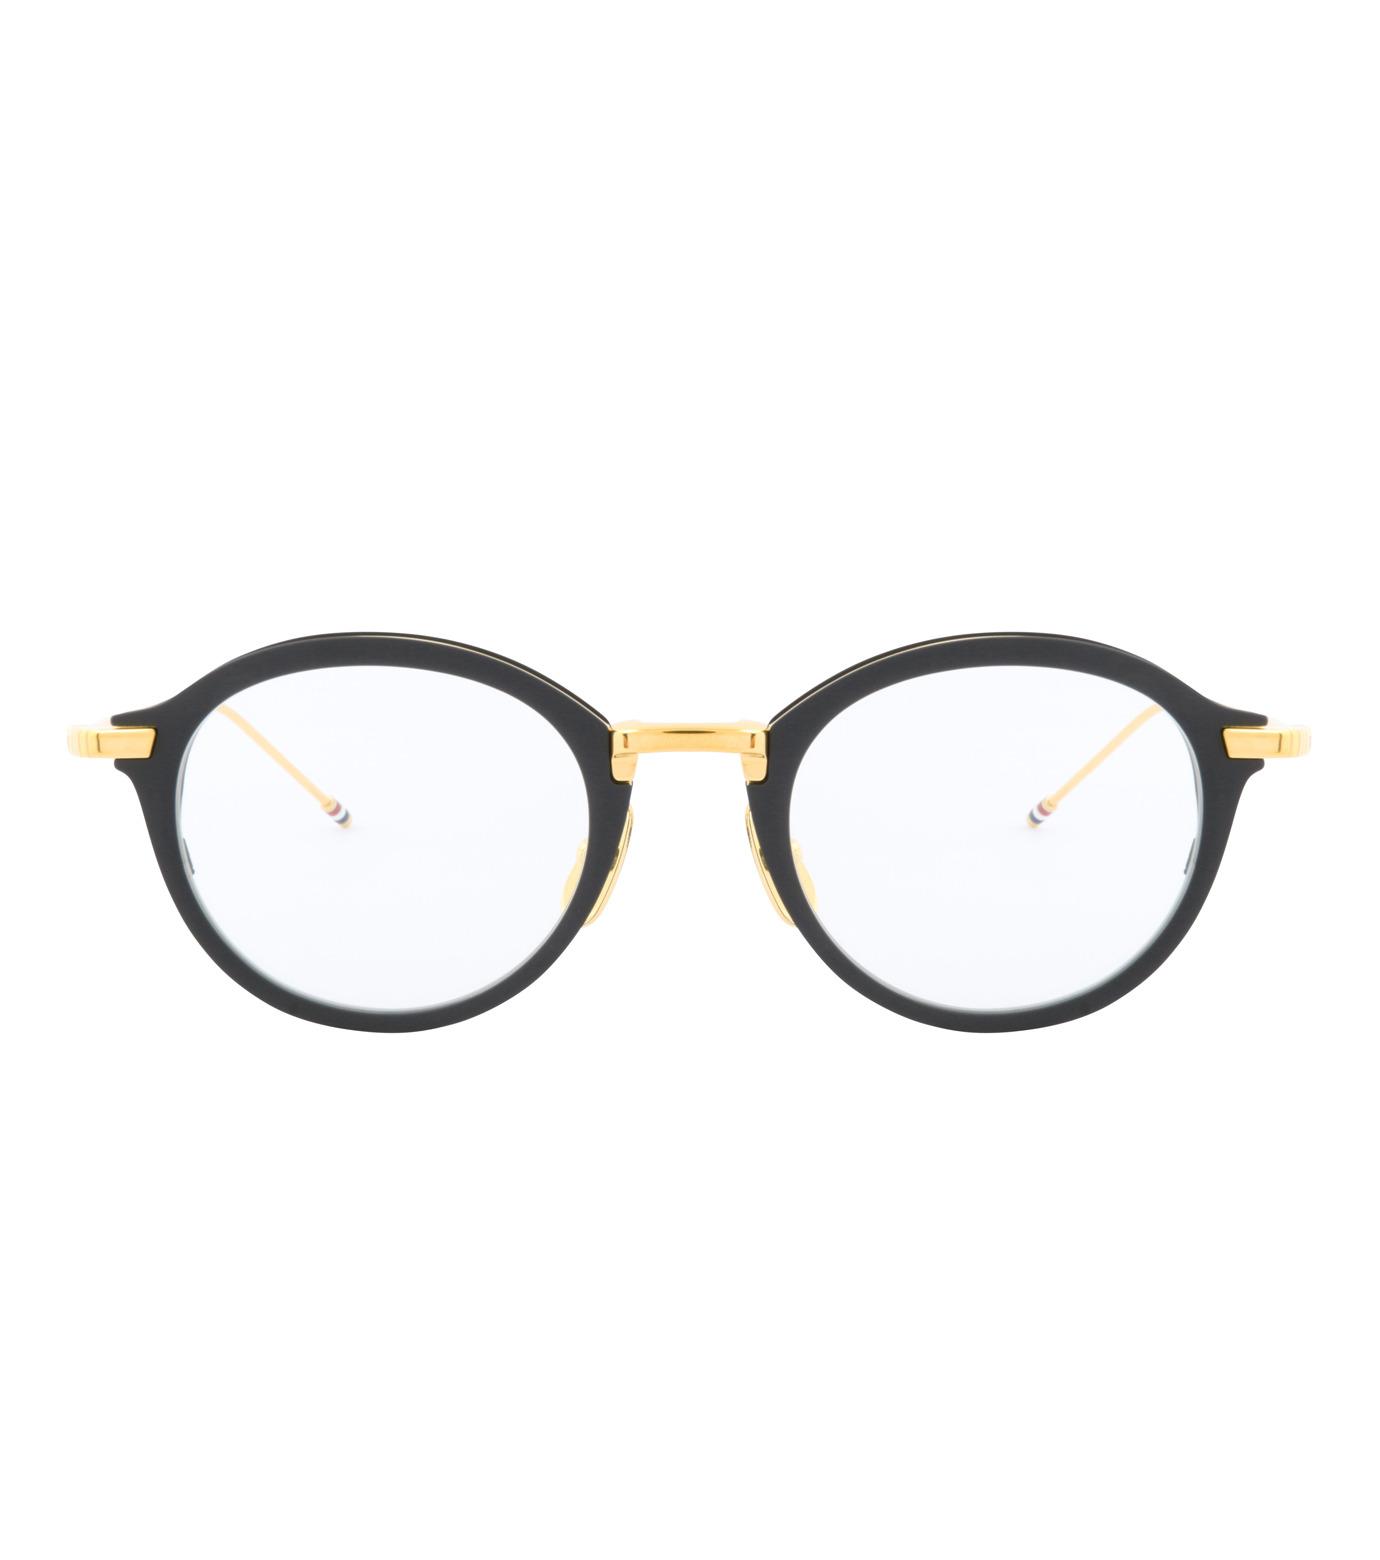 Thom Browne Eye Wear(トム・ブラウン・アイウェア)のRound Clear Lens-BLACK(アイウェア/eyewear)-TB-110-A-13 拡大詳細画像3